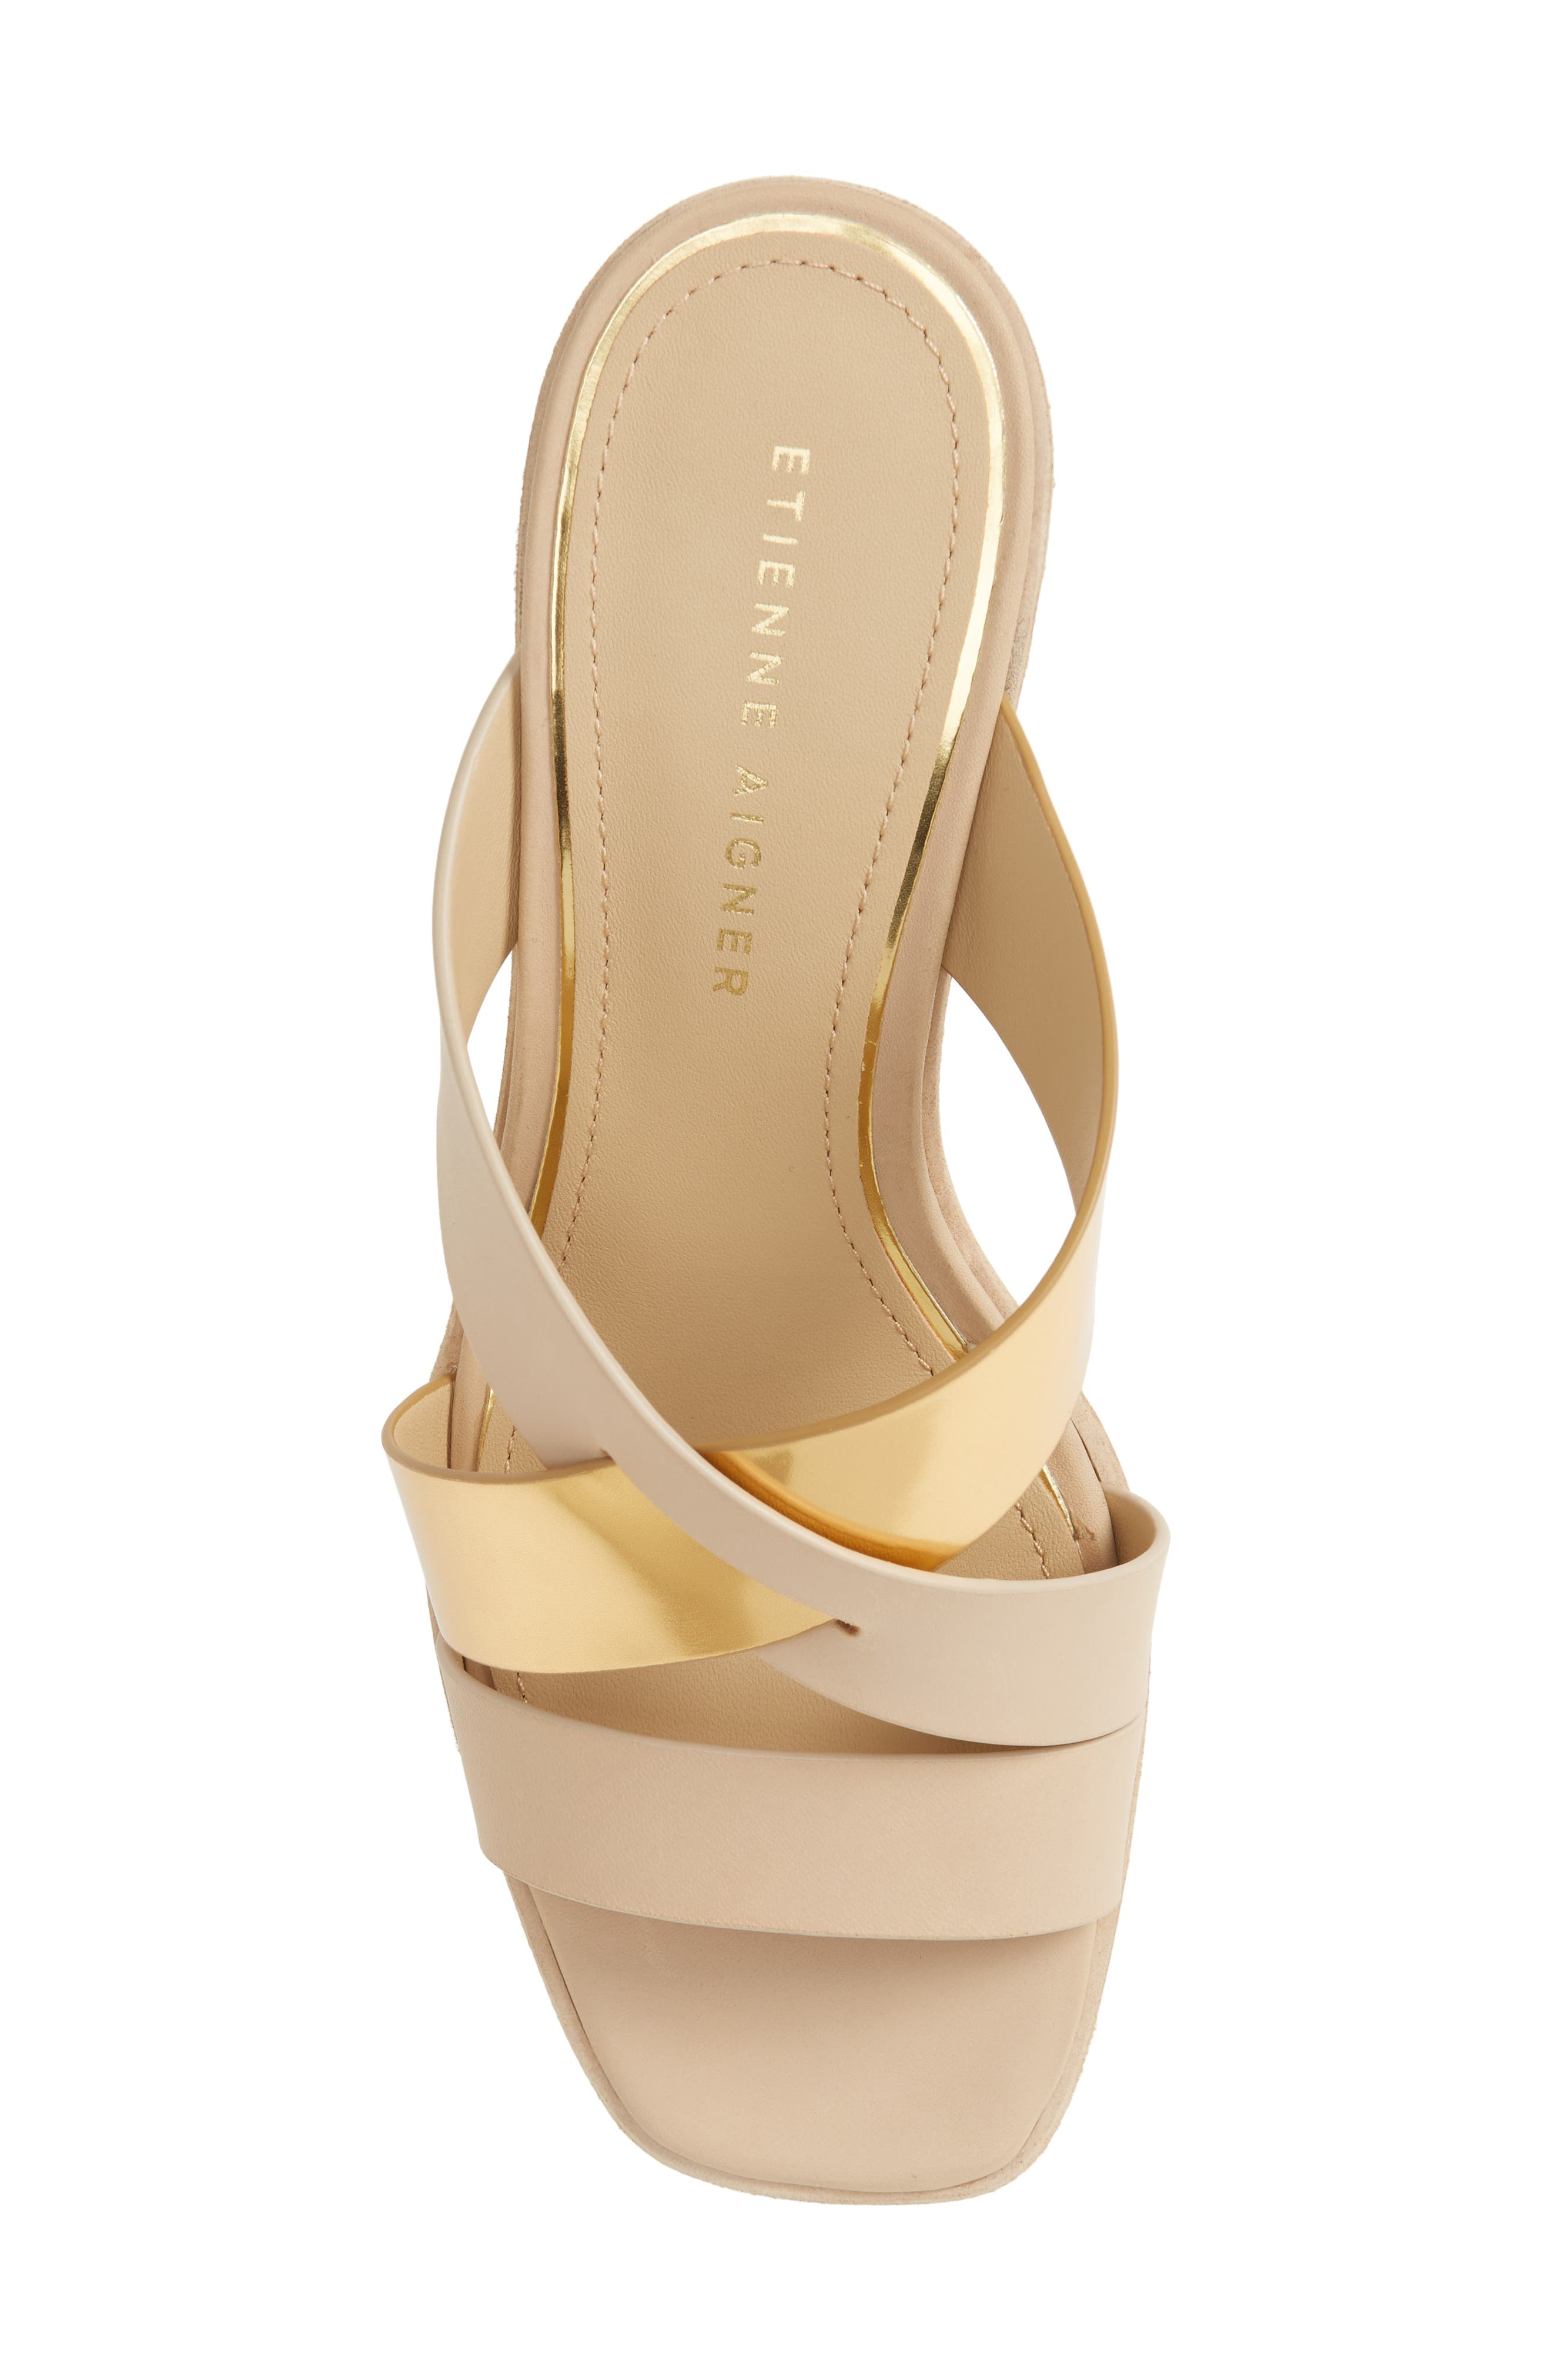 Negroni Cross Strap Mule Sandal,                             Alternate thumbnail 5, color,                             Natural/ Gold Leather